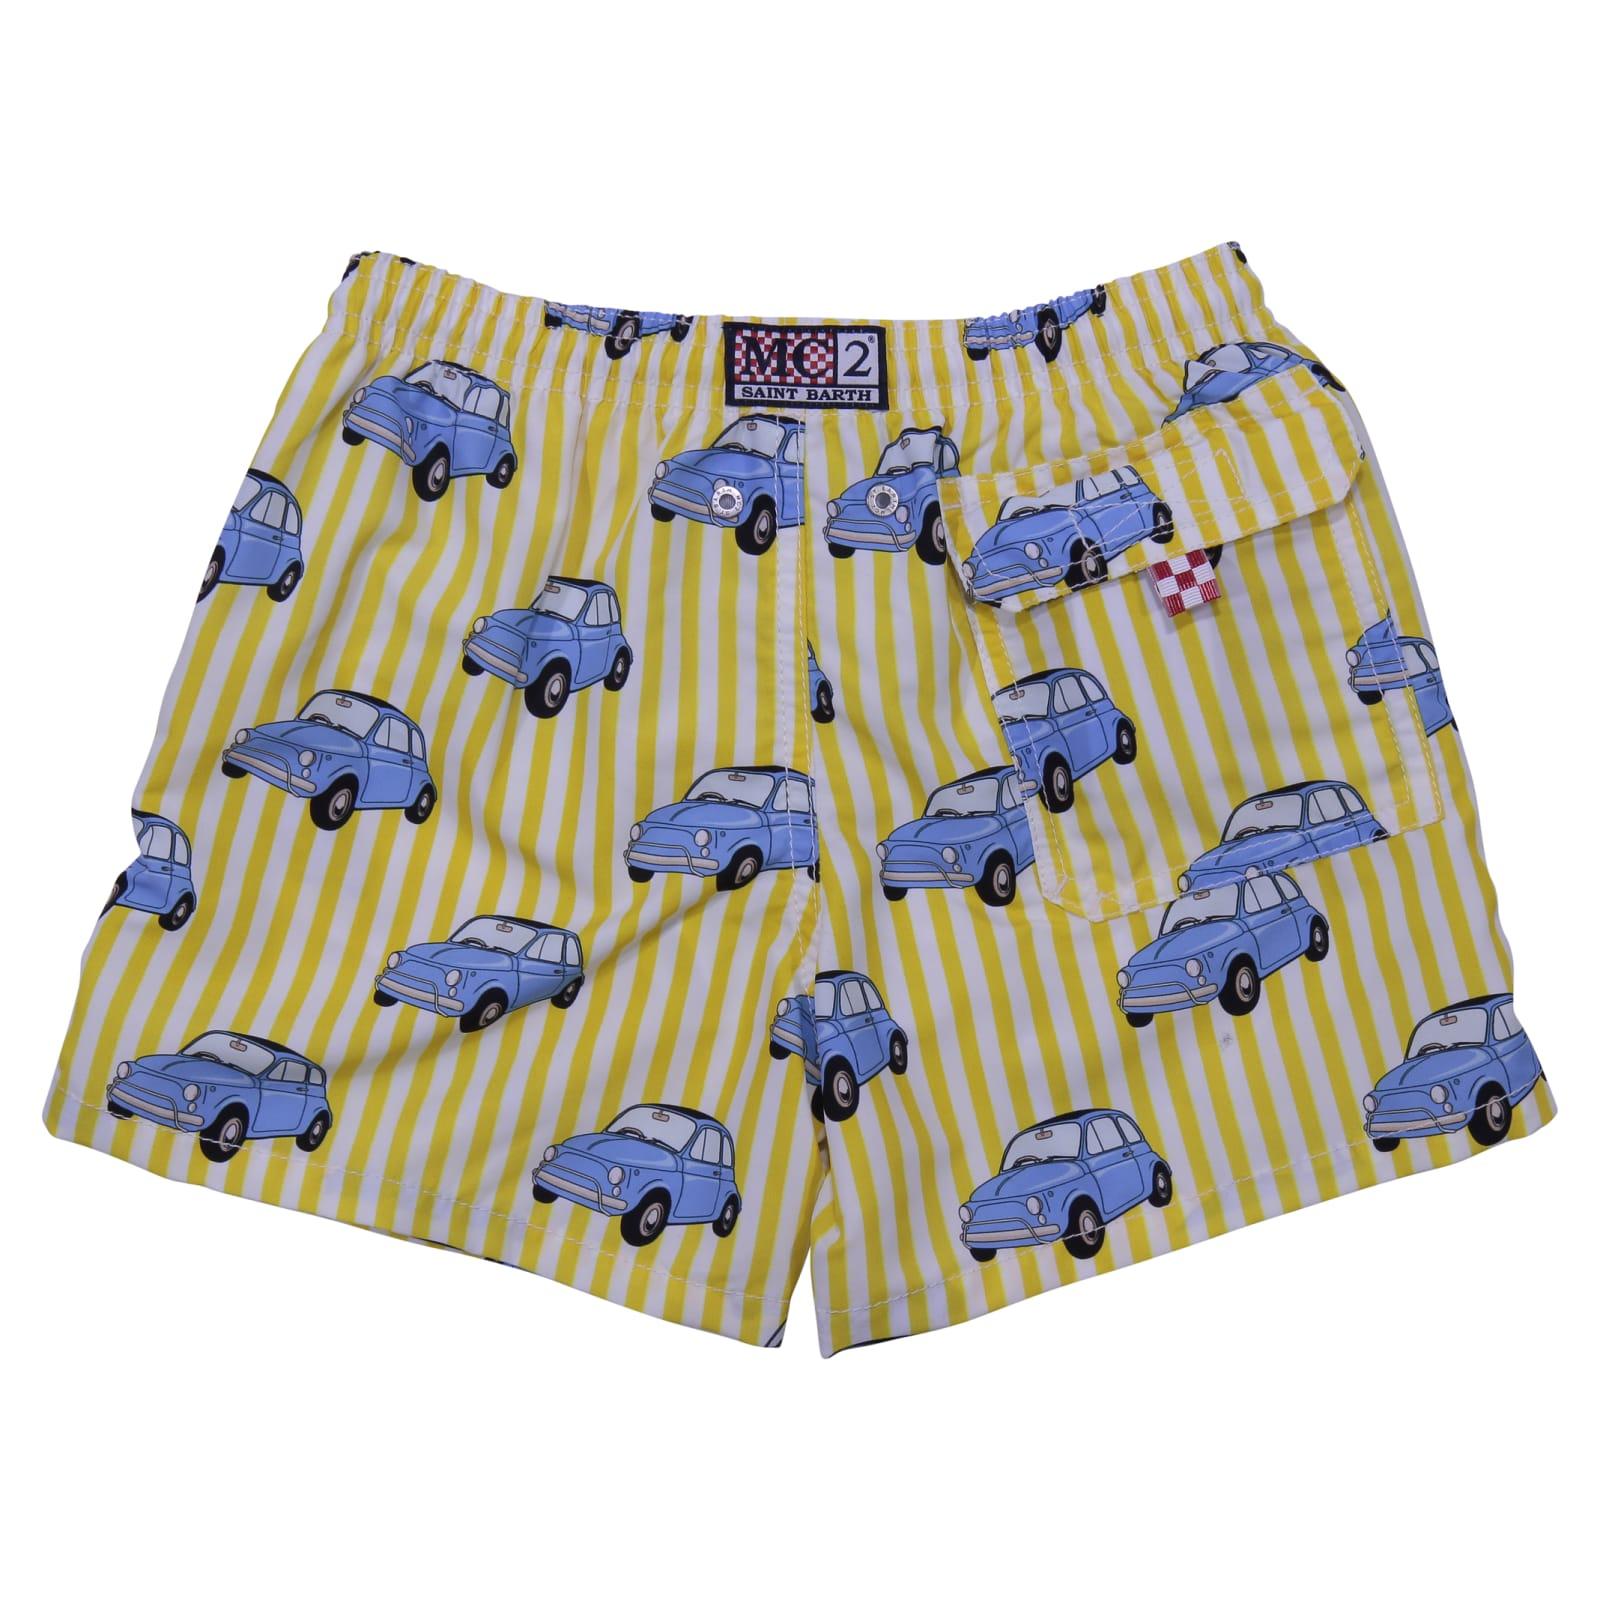 Best price on the market at italist | MC2 Saint Barth MC2 Saint Barth Unique Edition Fiat 500 Print Striped Nylon Swim Shorts